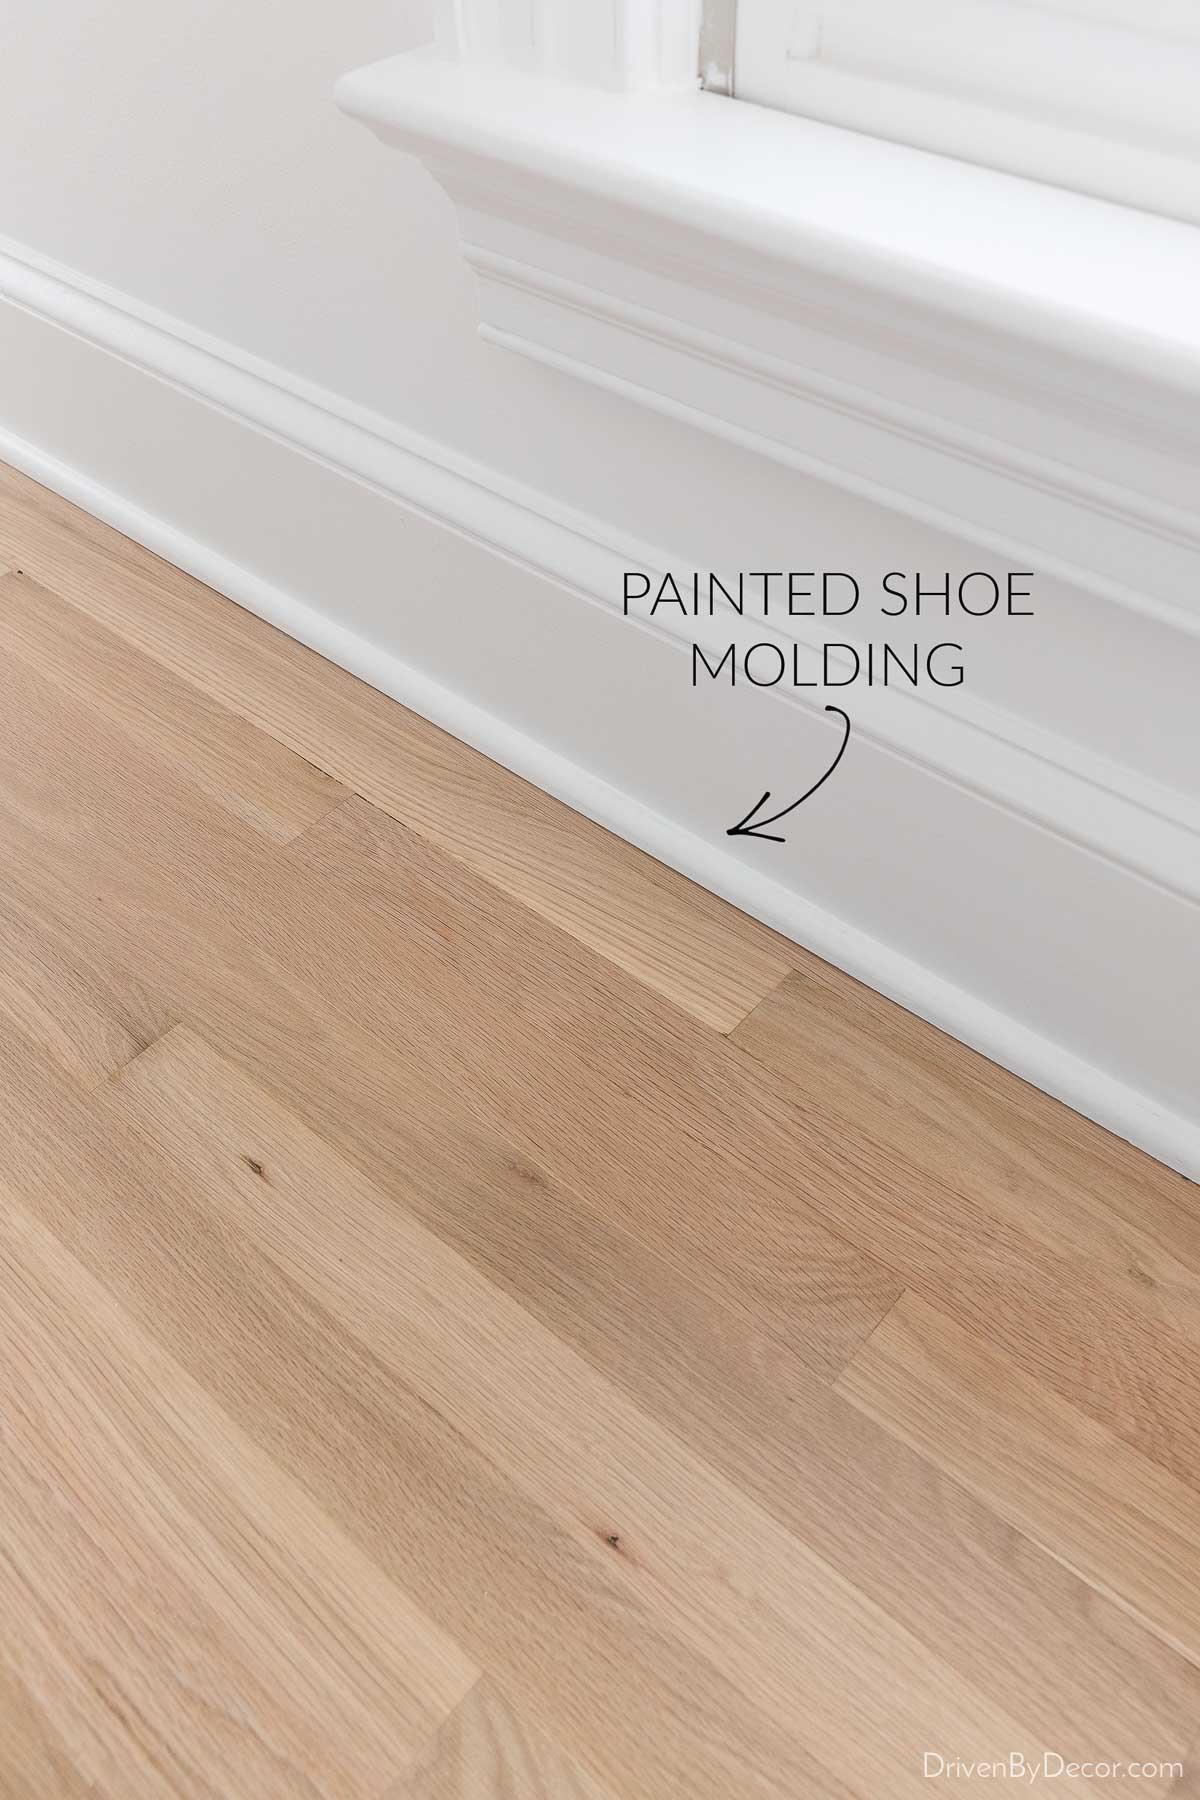 New shoe molding painted white